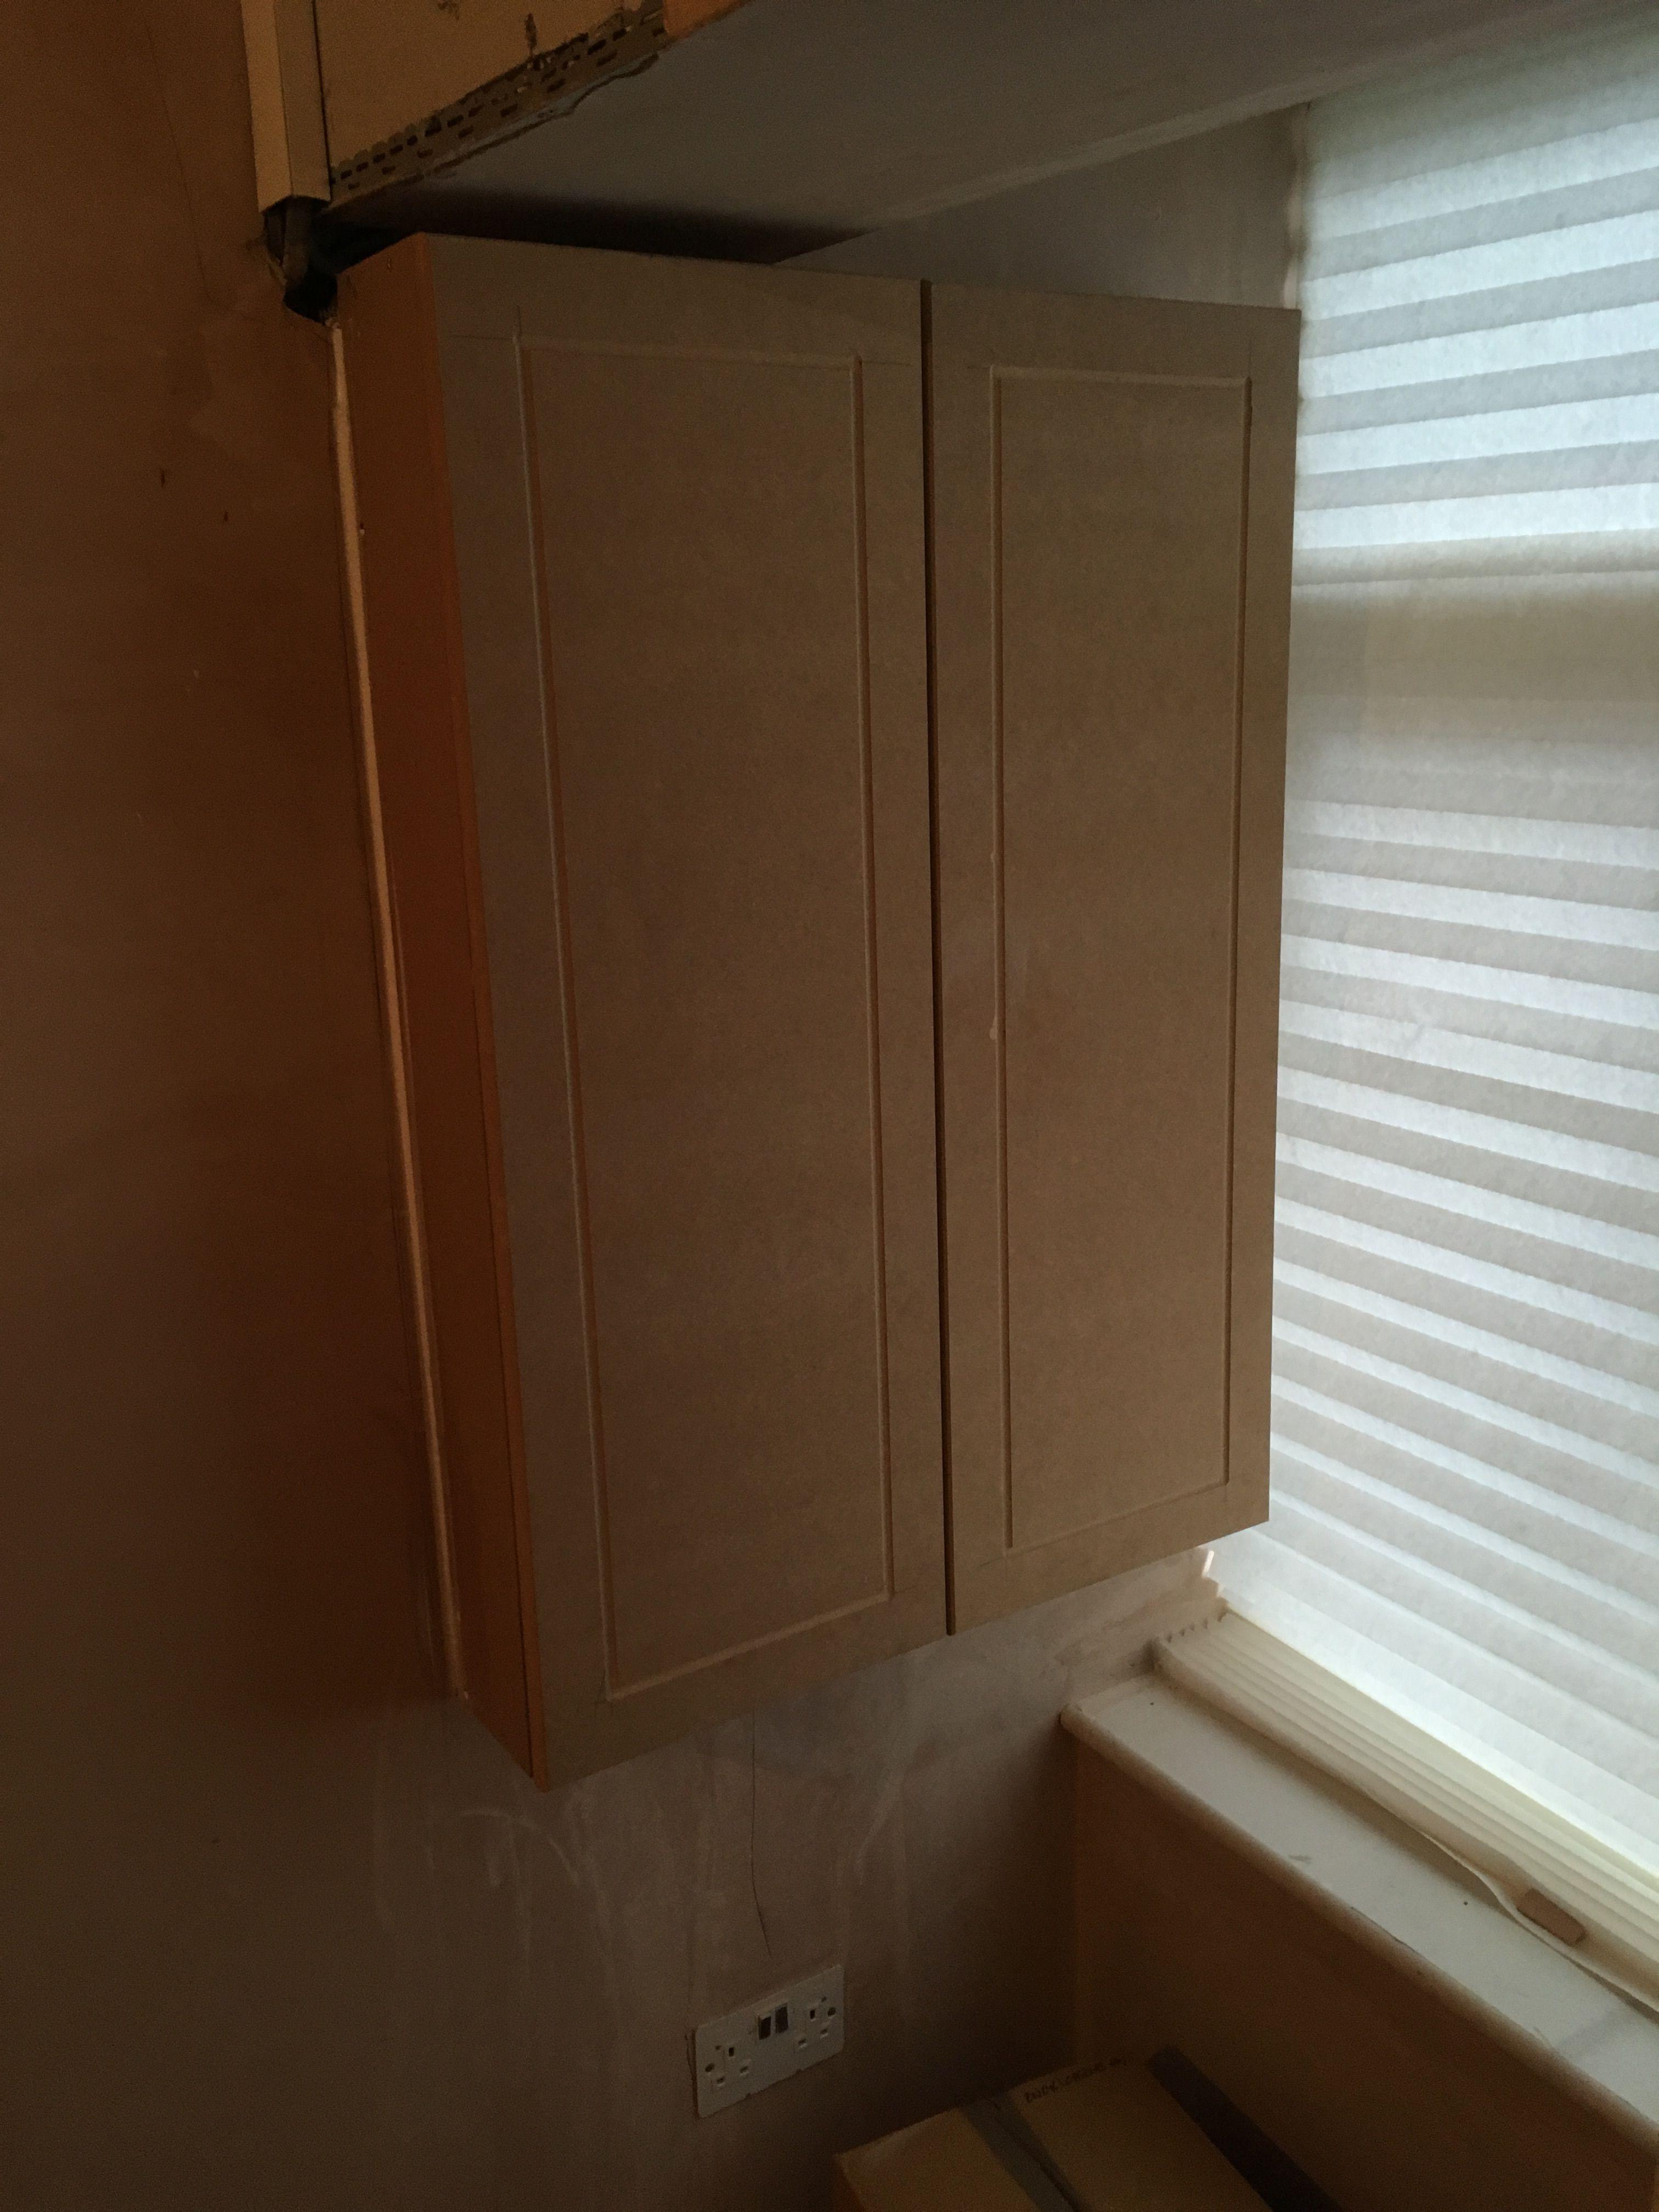 Cupboard housing electric fuse box Electric Fuse Box, Cupboard, Bespoke,  Footlocker, Armoire